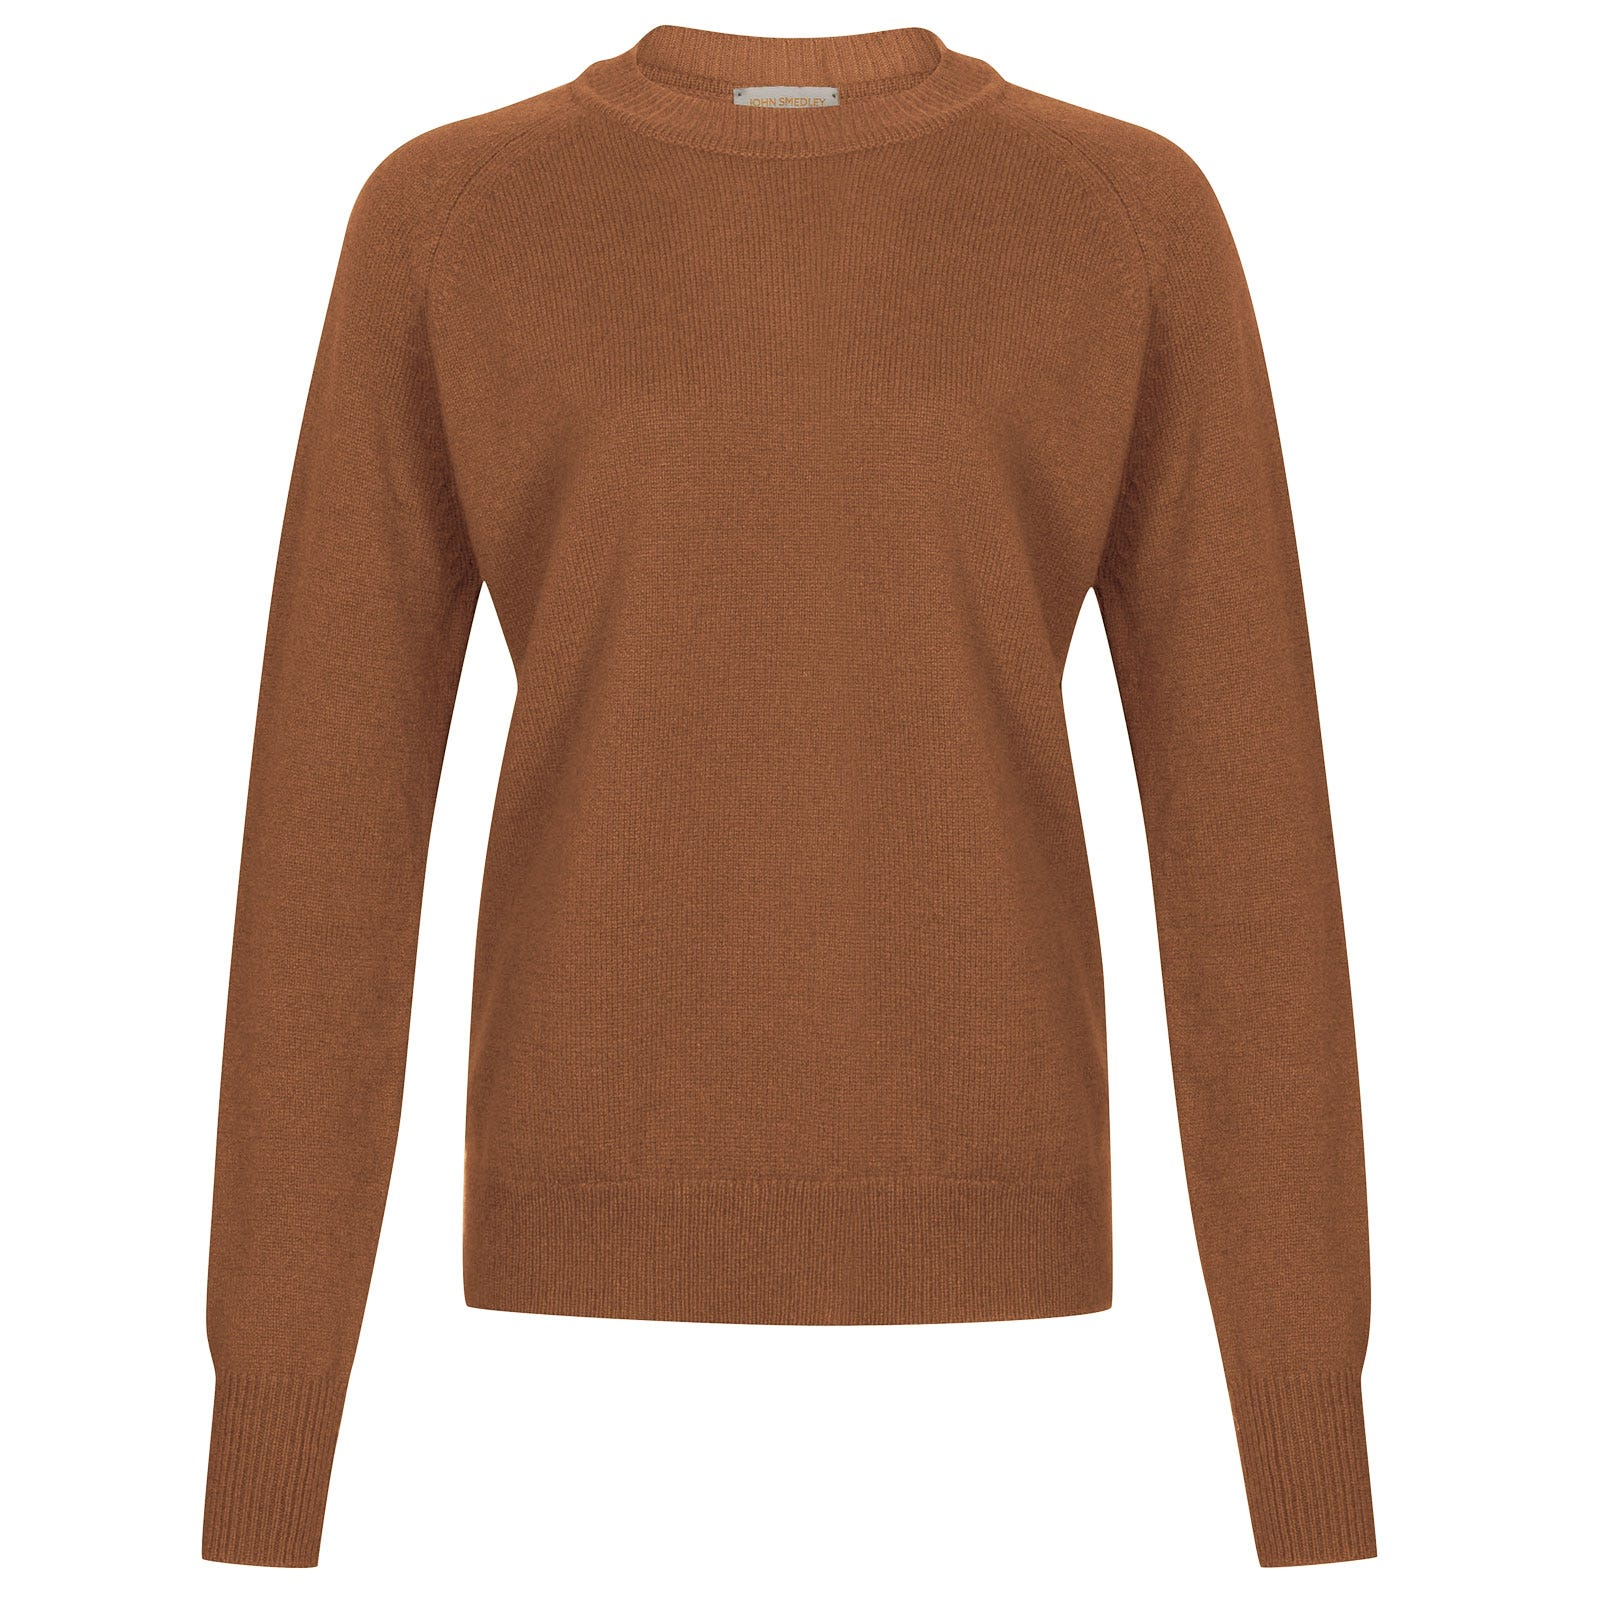 John Smedley dillon Merino Wool & Cashmere Sweater in Camel-M